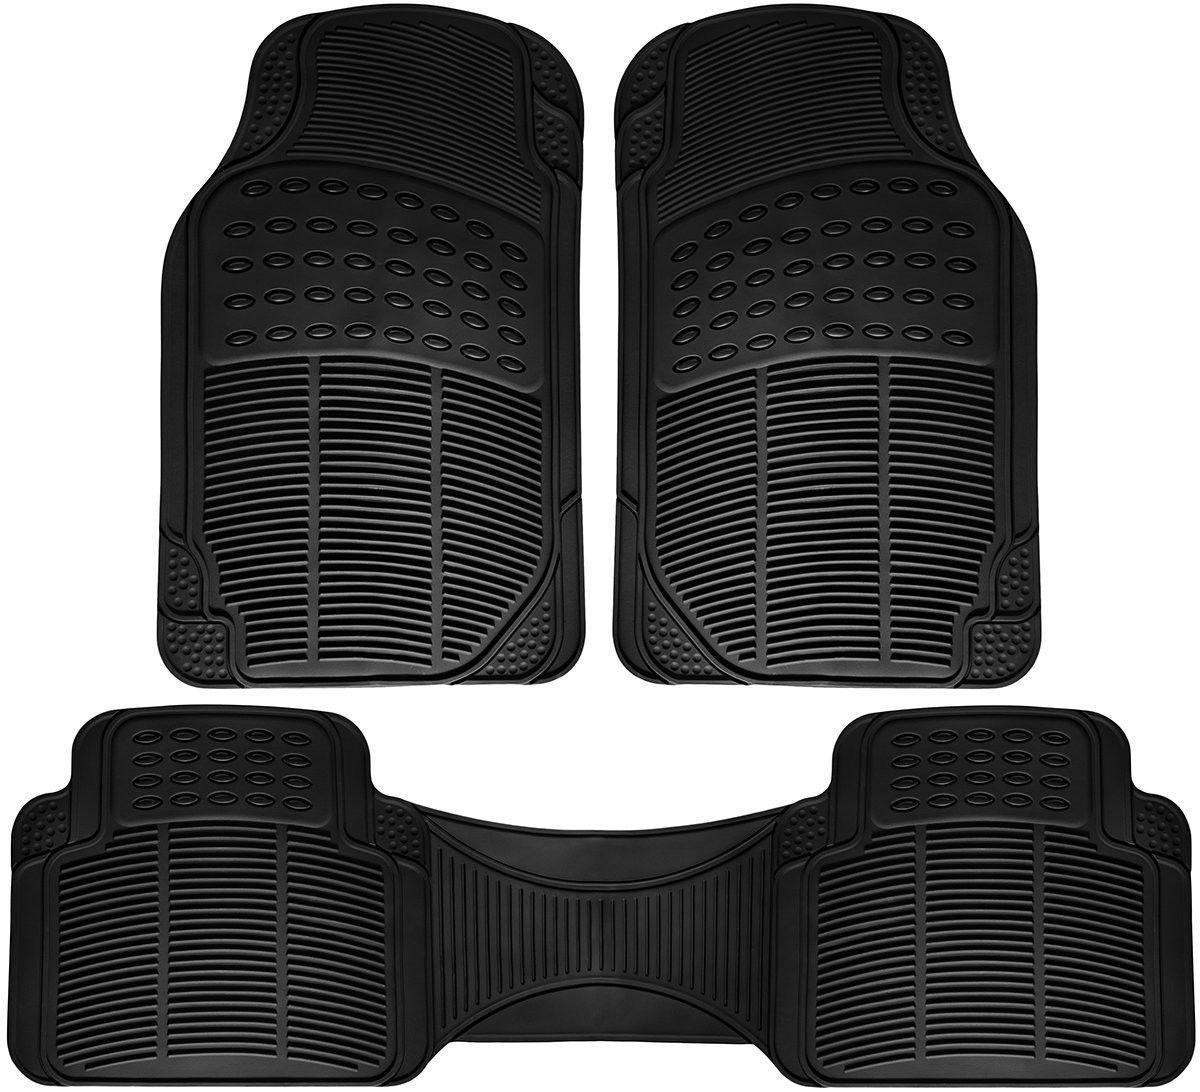 ridged mats van floor full piece duty pin car suv set oxgord heavy fit rubber truck universal